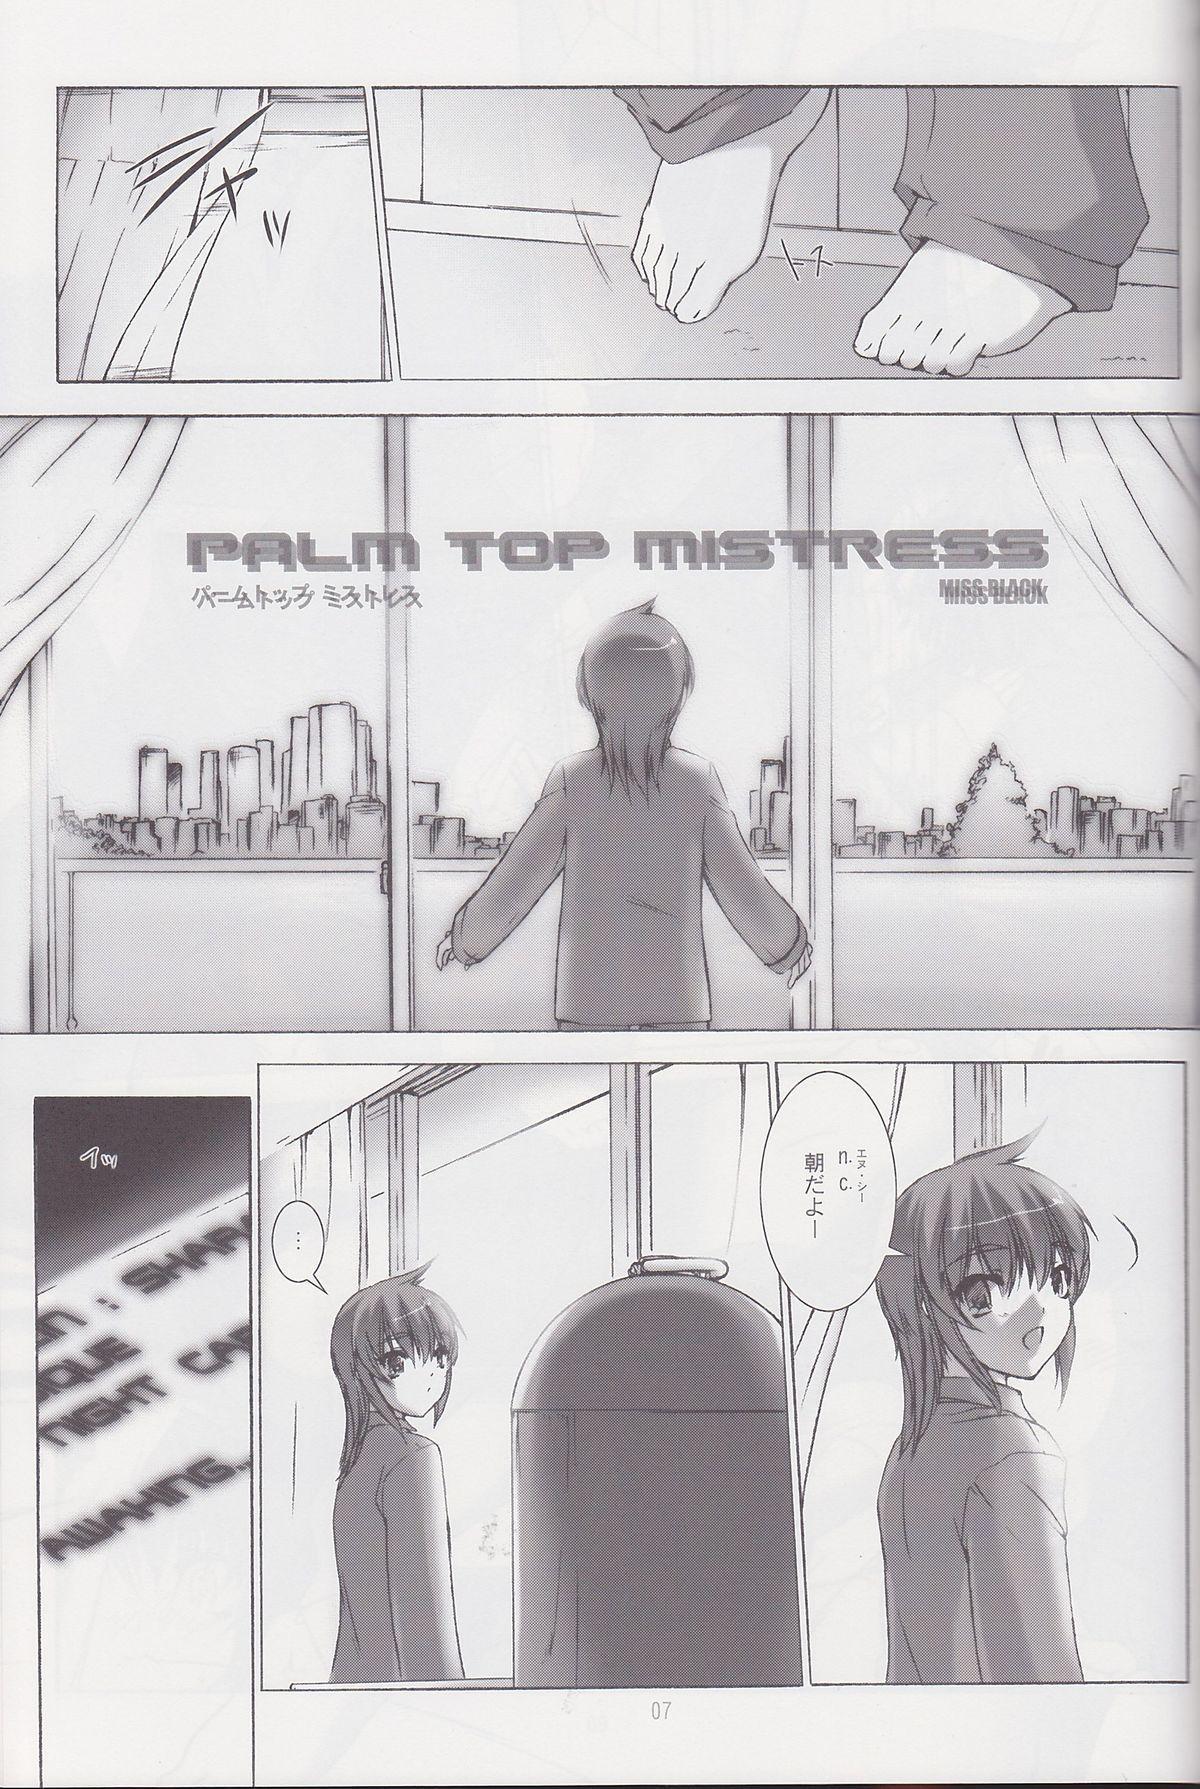 Palm top mistress 7